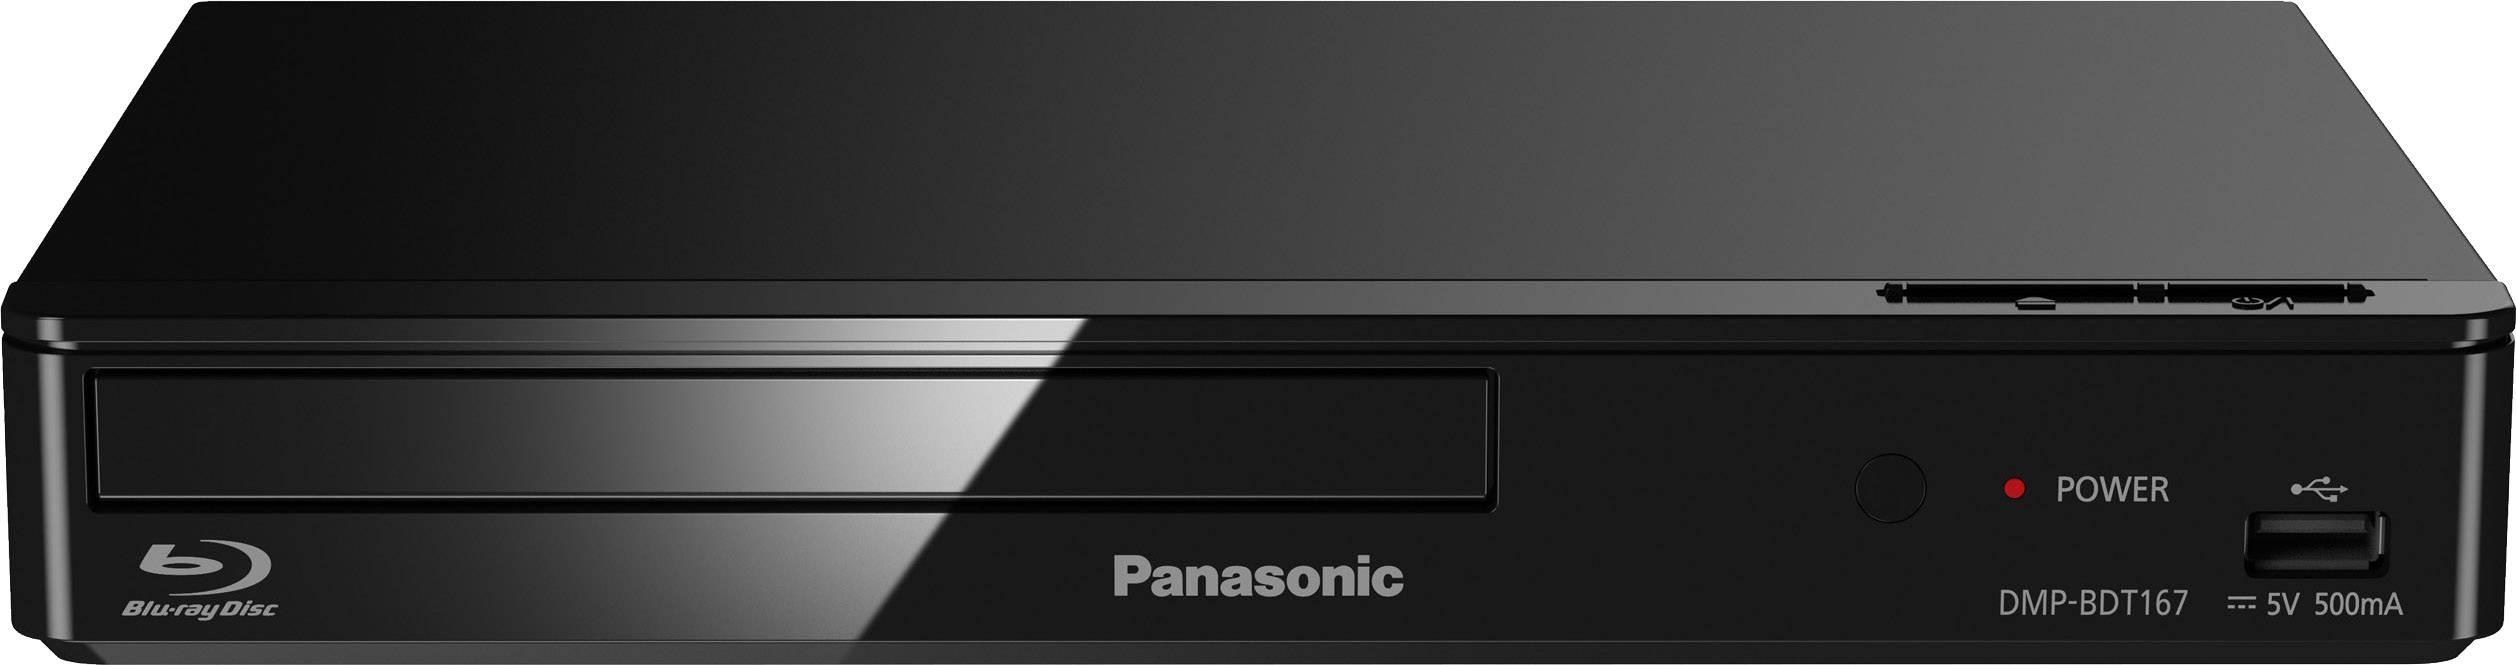 3D Blu-Ray přehrávač Panasonic DMP-BDT167, Full HD upscaling, černá